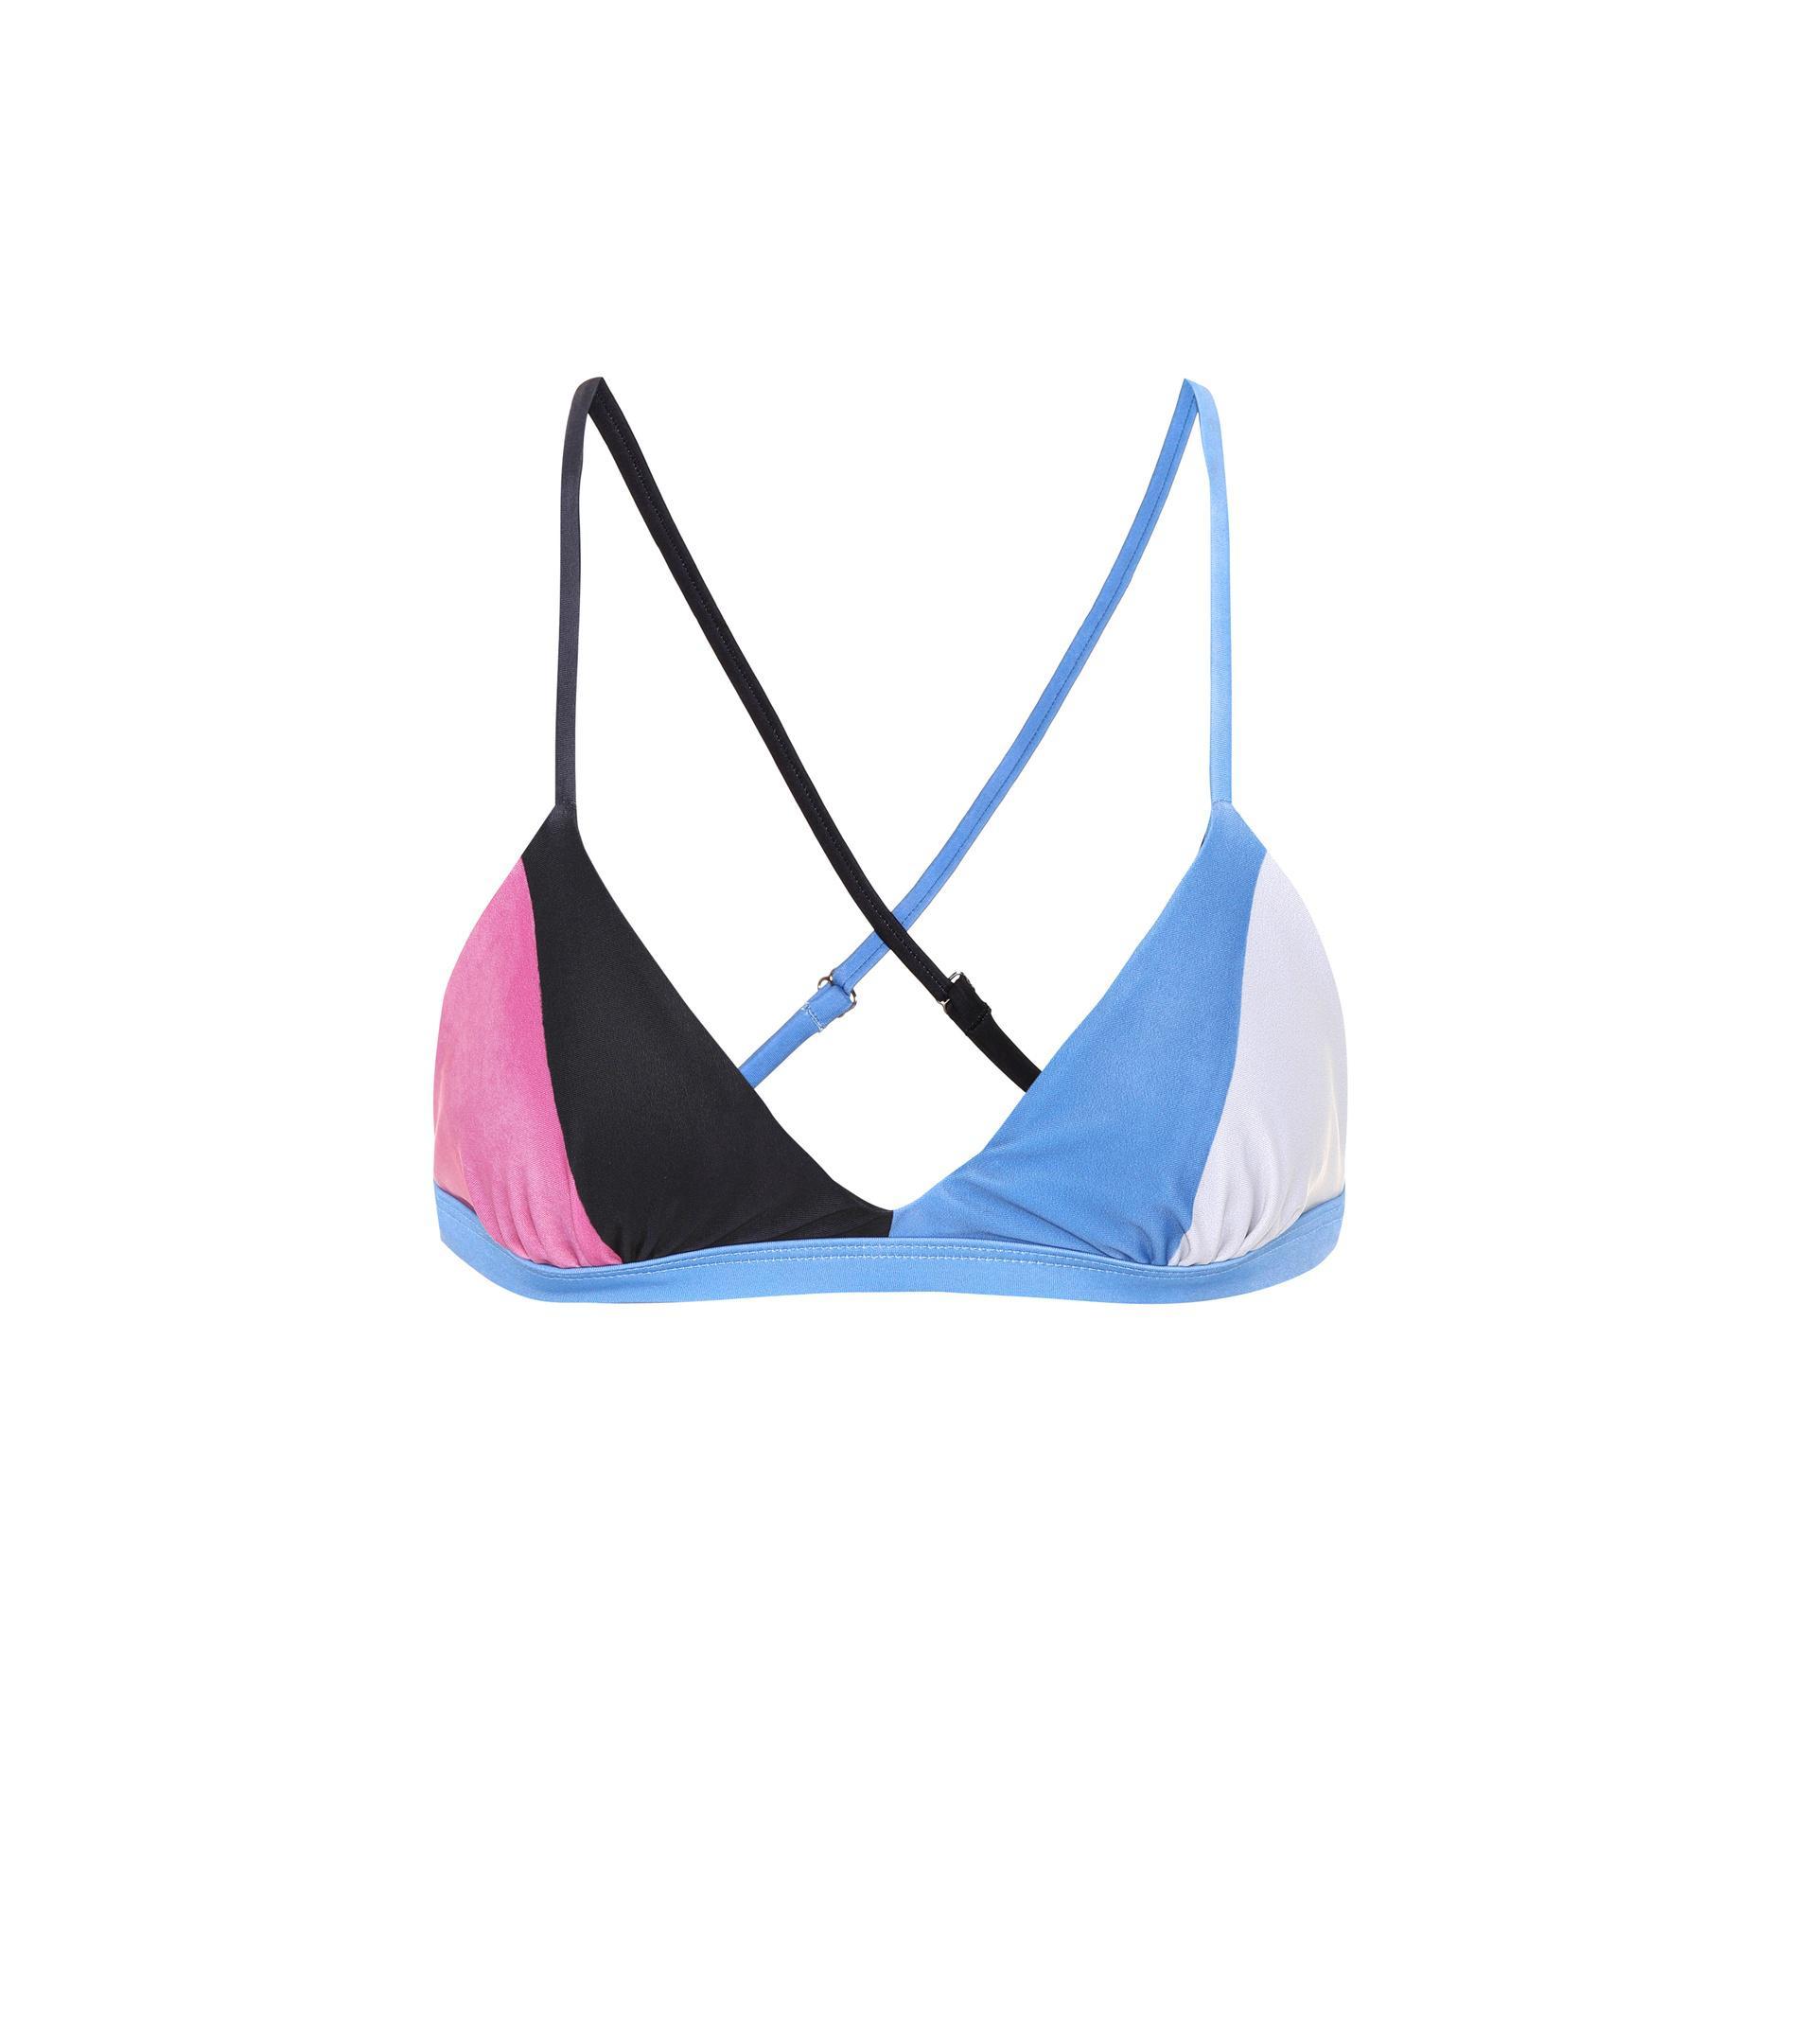 Mara Hoffman Haut de bikini triangle Soleil Images Footlocker En Ligne 8MHKzH